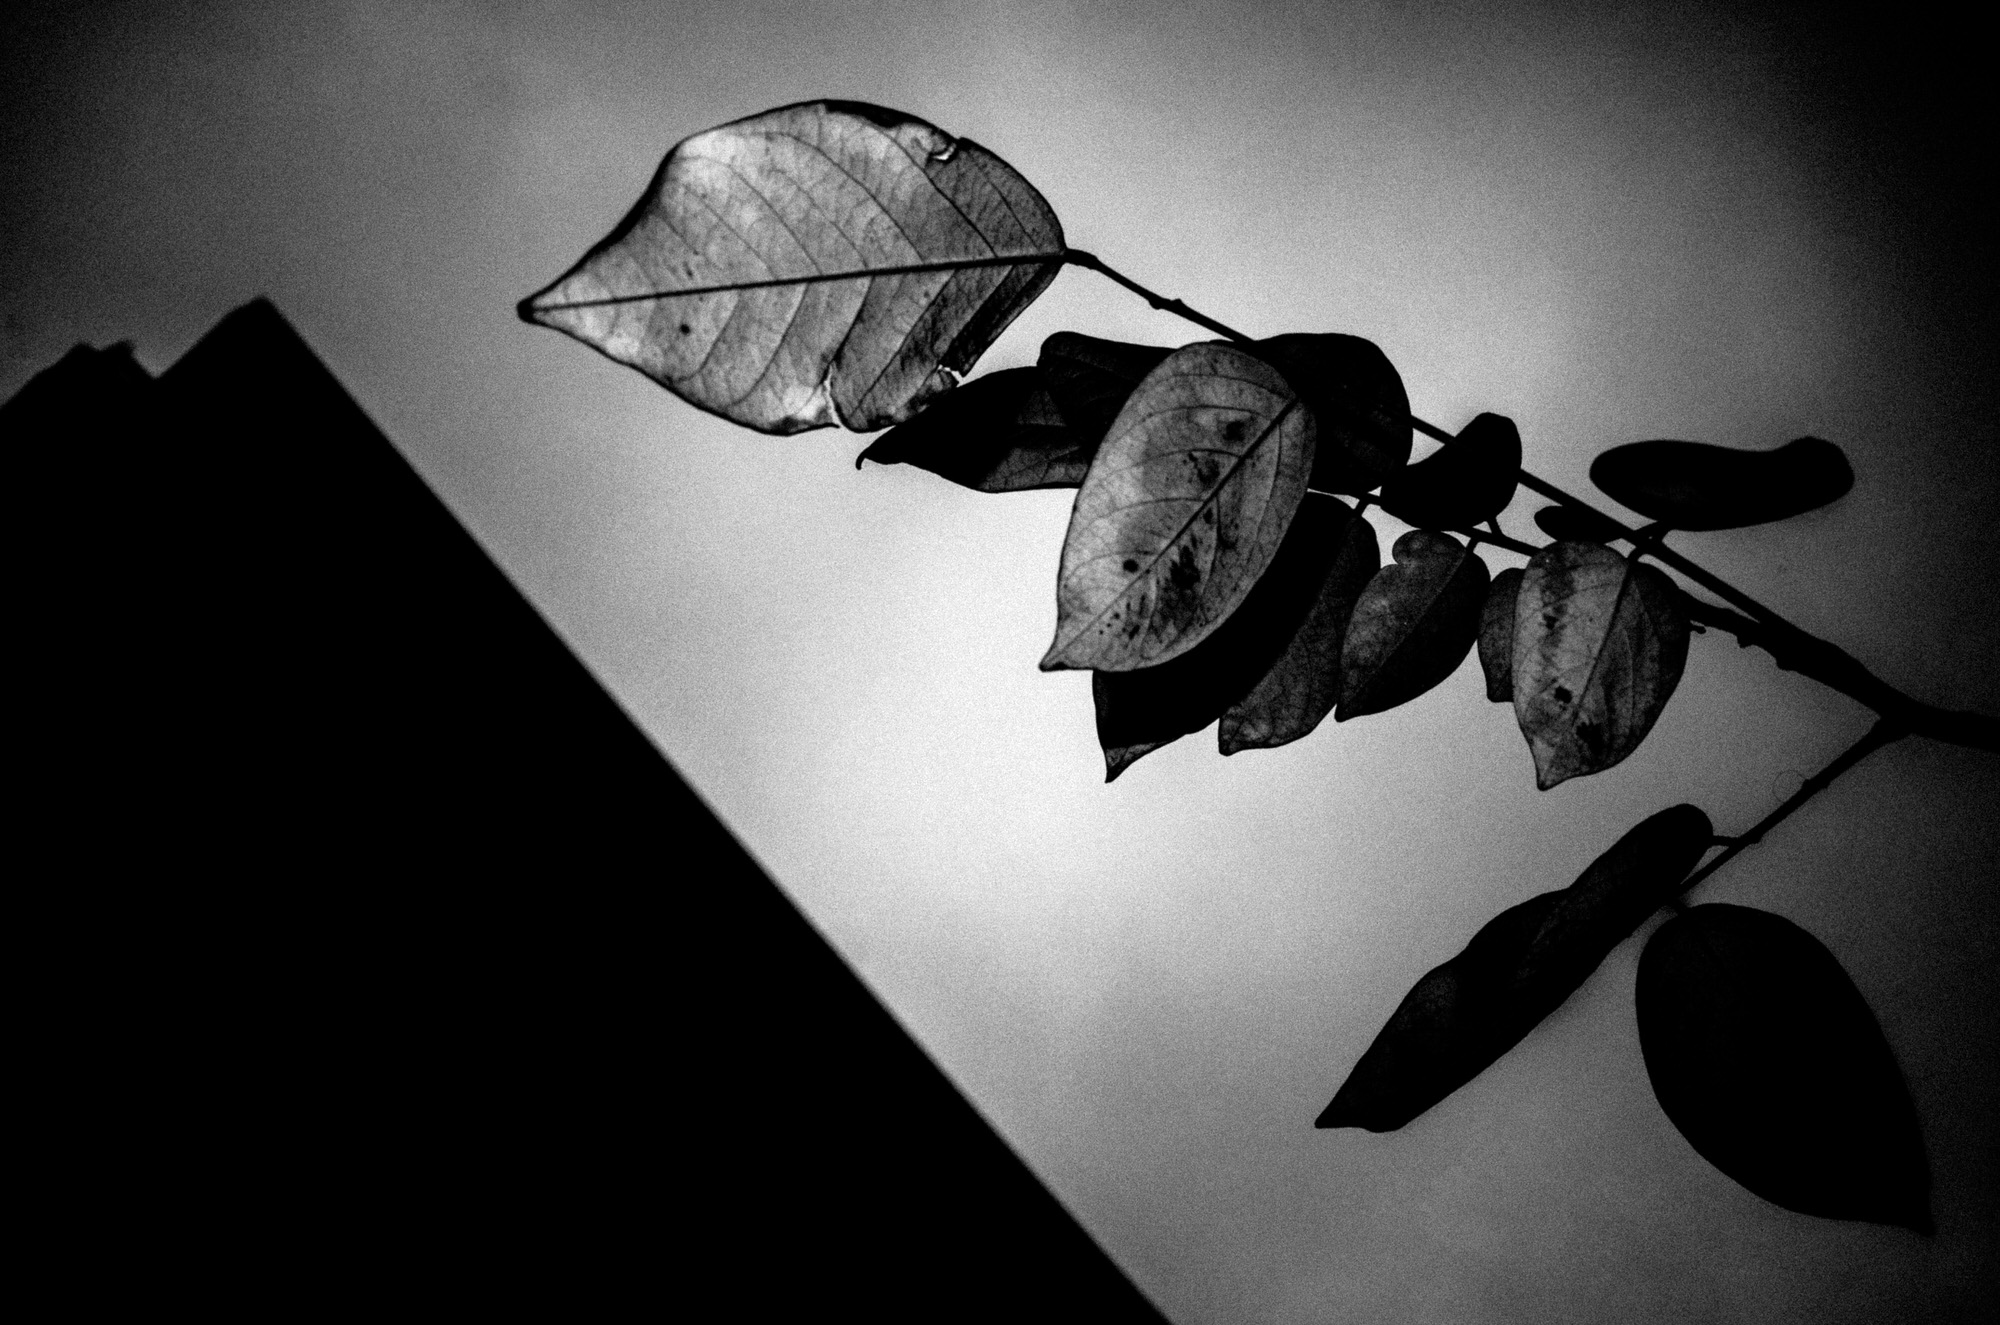 eric kim photography black and white - 33269646642_1a6c31c4ed_o